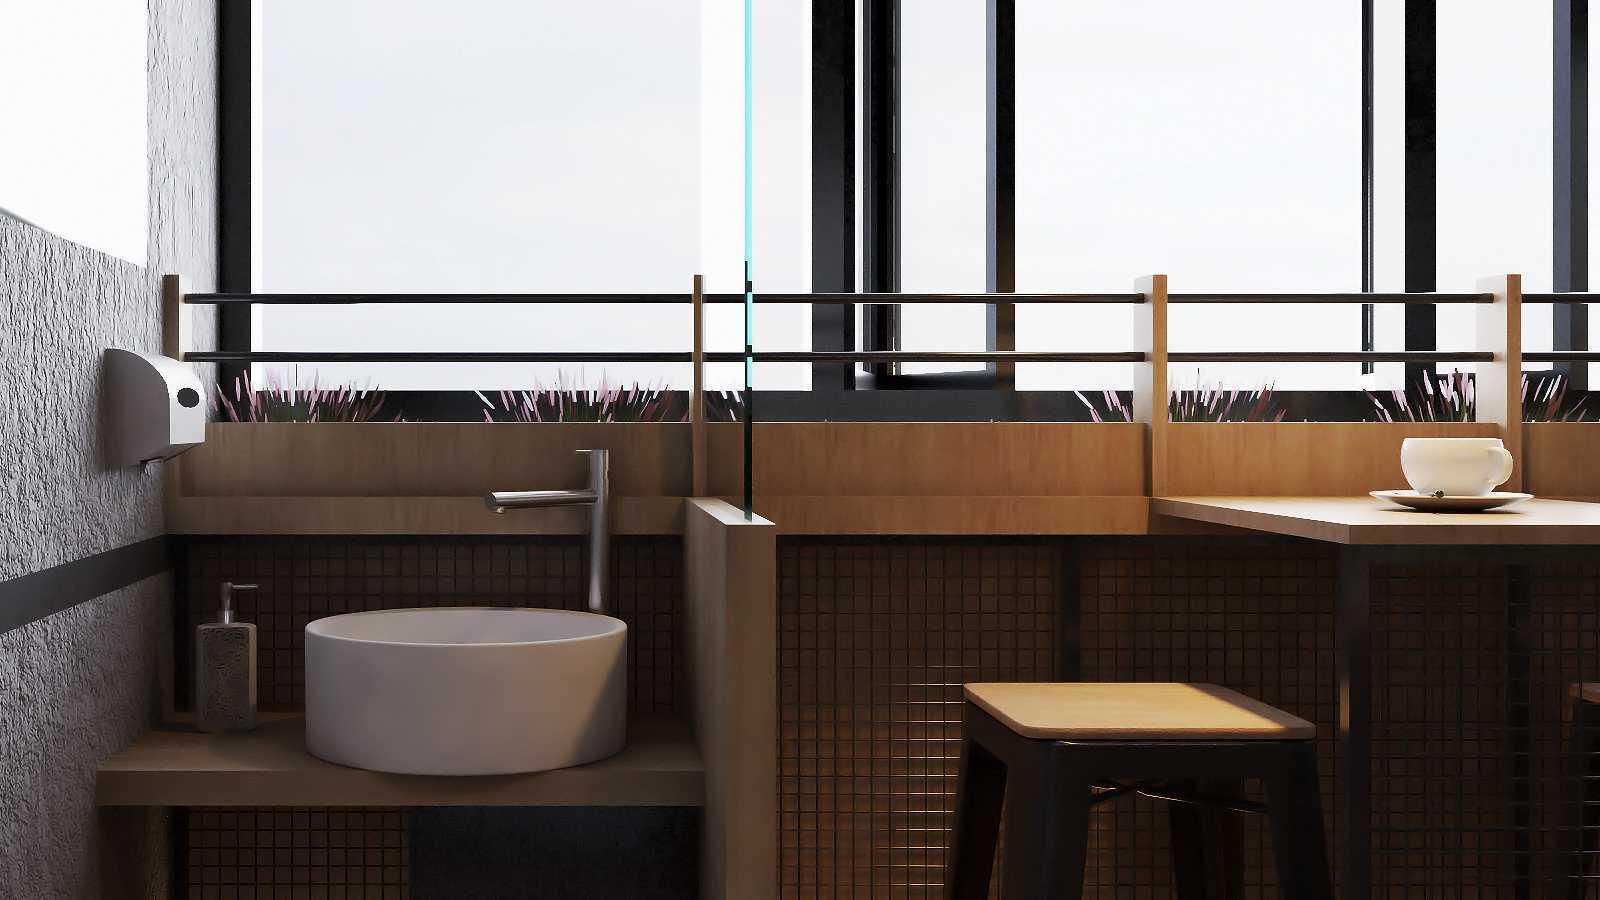 Sections Design & Architecture Premium Burger Restaurant Project (Cipete) Jl. Cipete Raya, Cipete Sel., Kec. Cilandak, Kota Jakarta Selatan, Daerah Khusus Ibukota Jakarta, Indonesia Jl. Cipete Raya, Cipete Sel., Kec. Cilandak, Kota Jakarta Selatan, Daerah Khusus Ibukota Jakarta, Indonesia Sections-Design-Architecture-Premium-Burger-Restaurant-Project-Cipete  123198